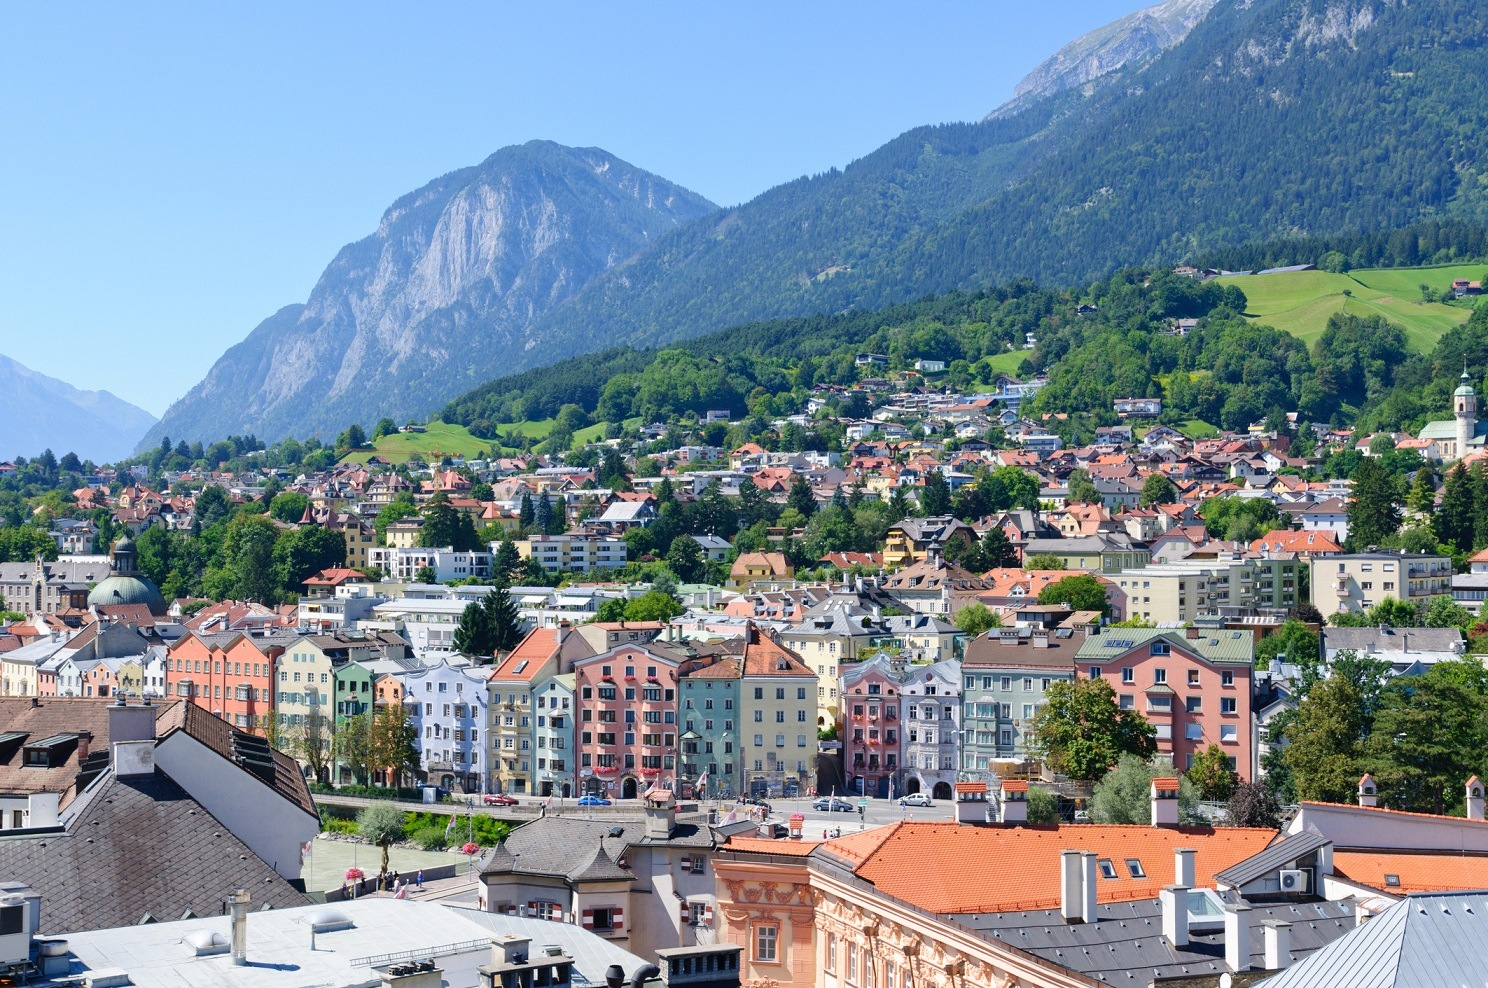 Cityscape of Innsbruck in Austria